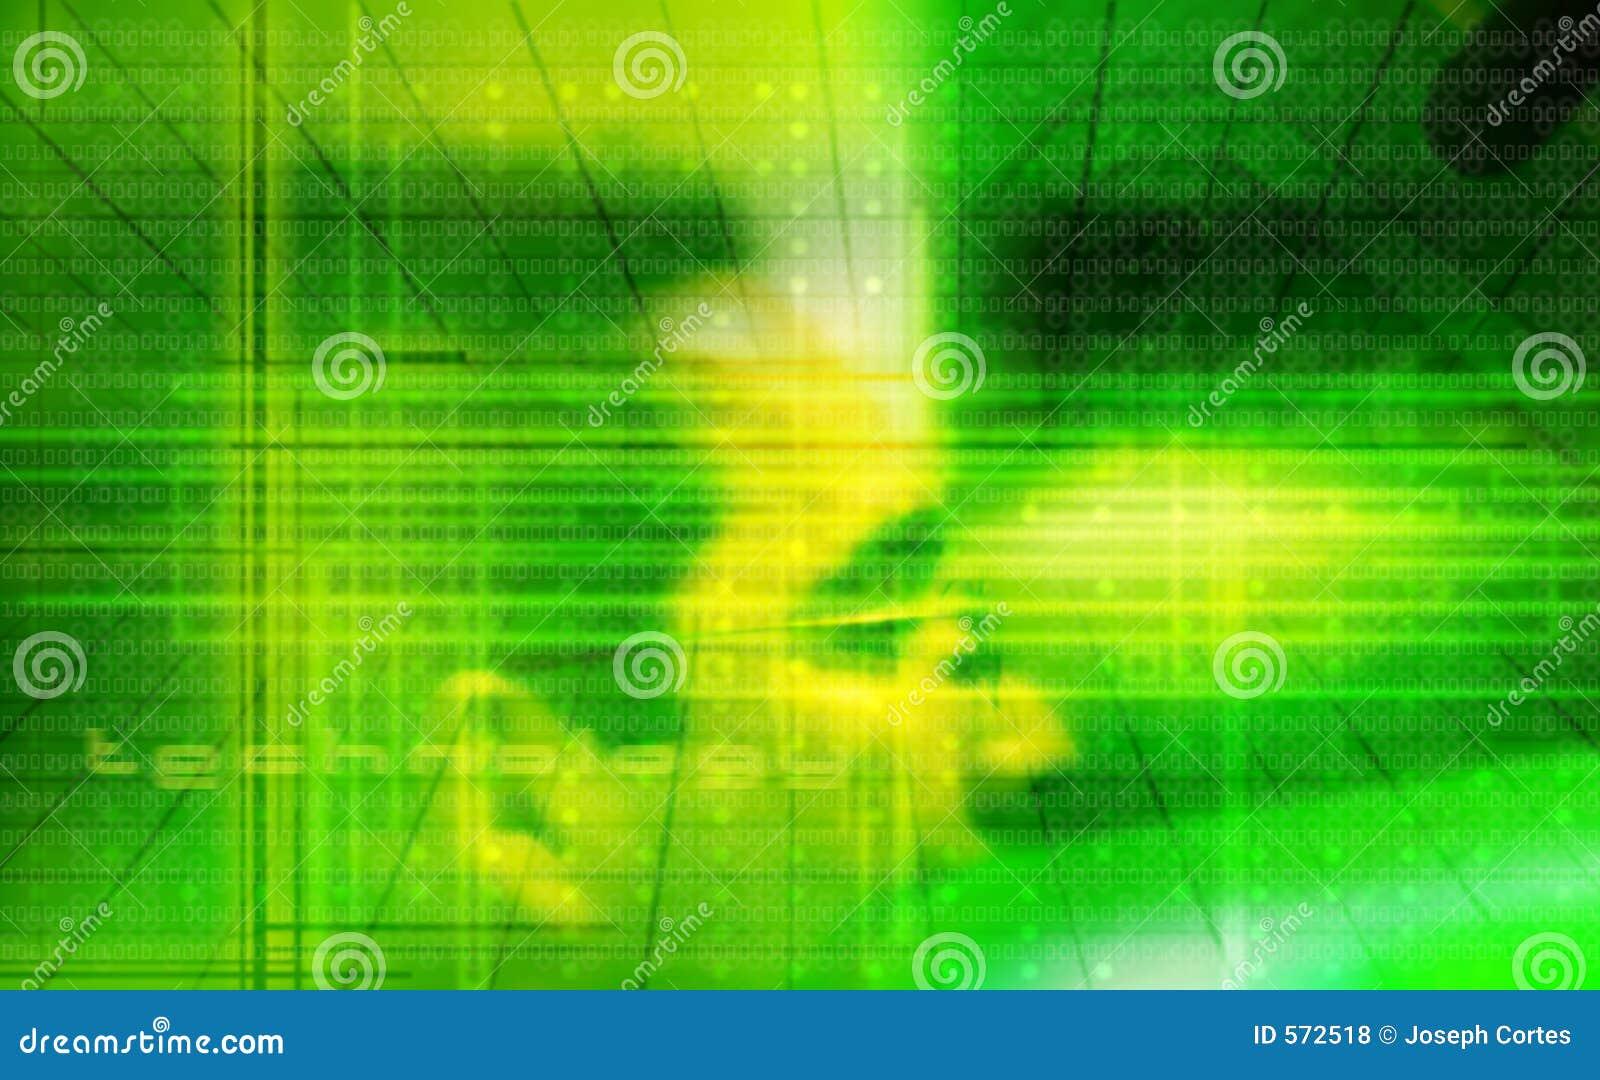 Tecnology in green